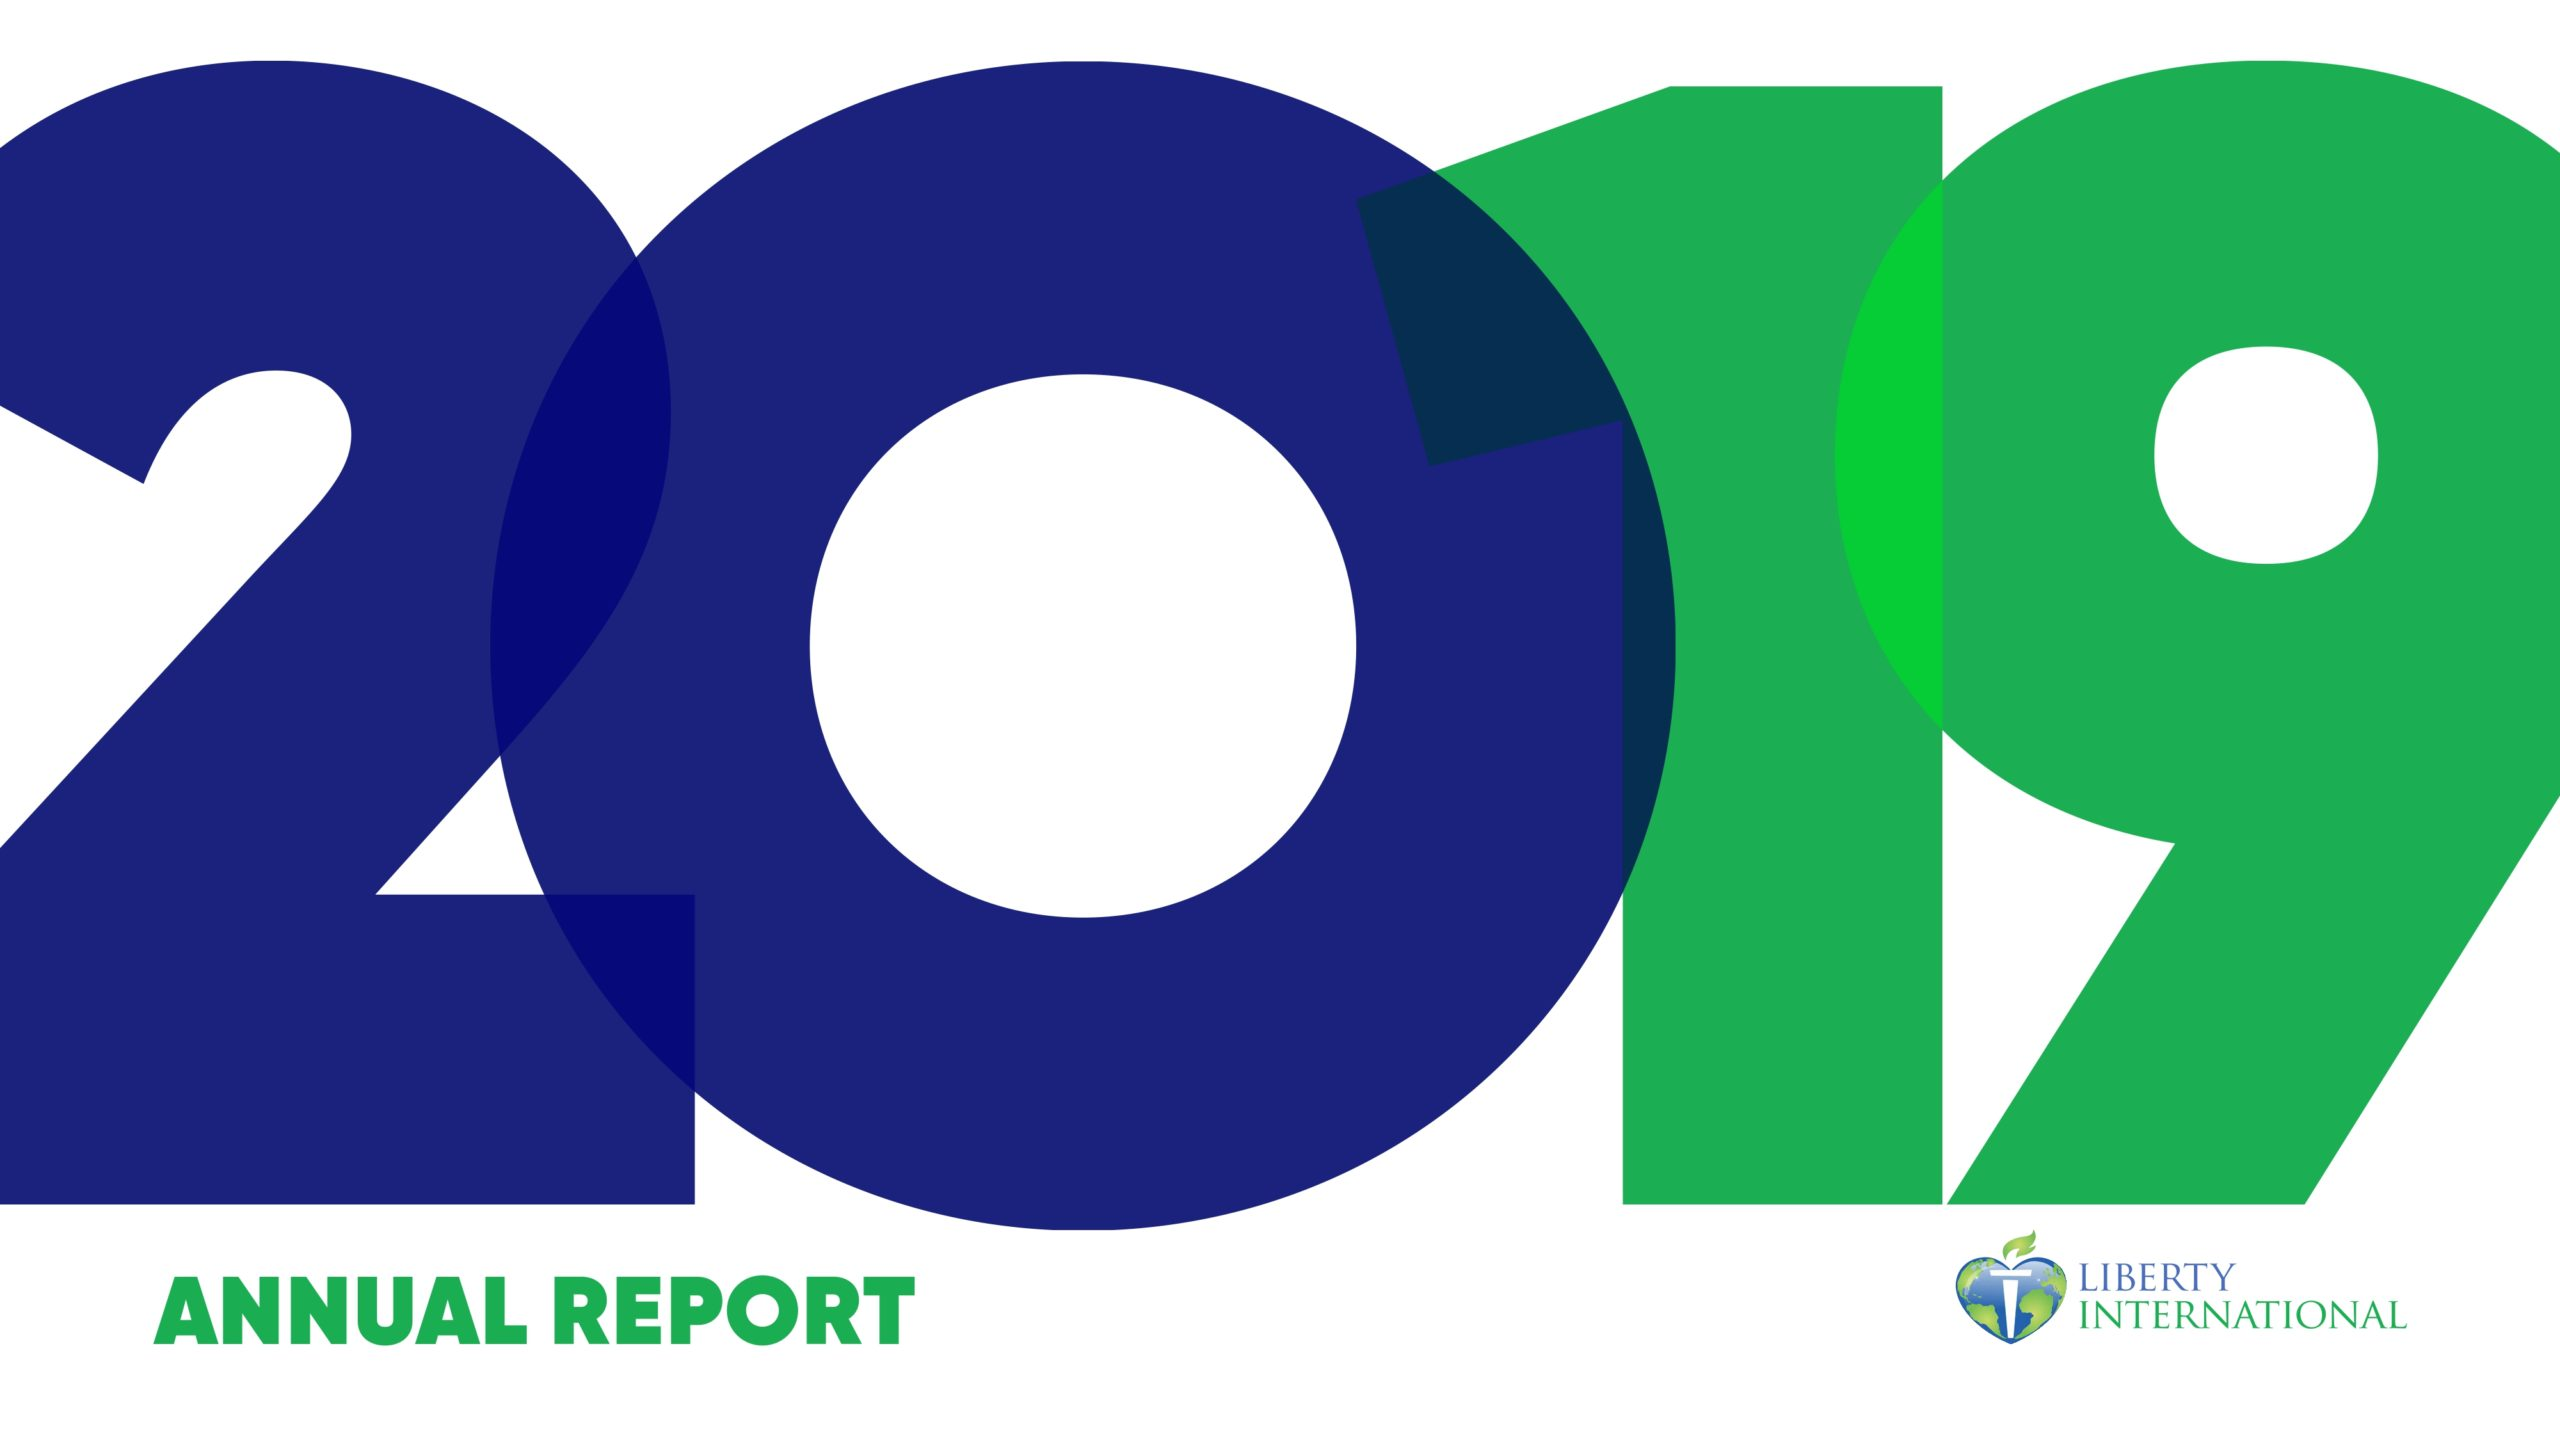 Liberty International Annual Report 2019